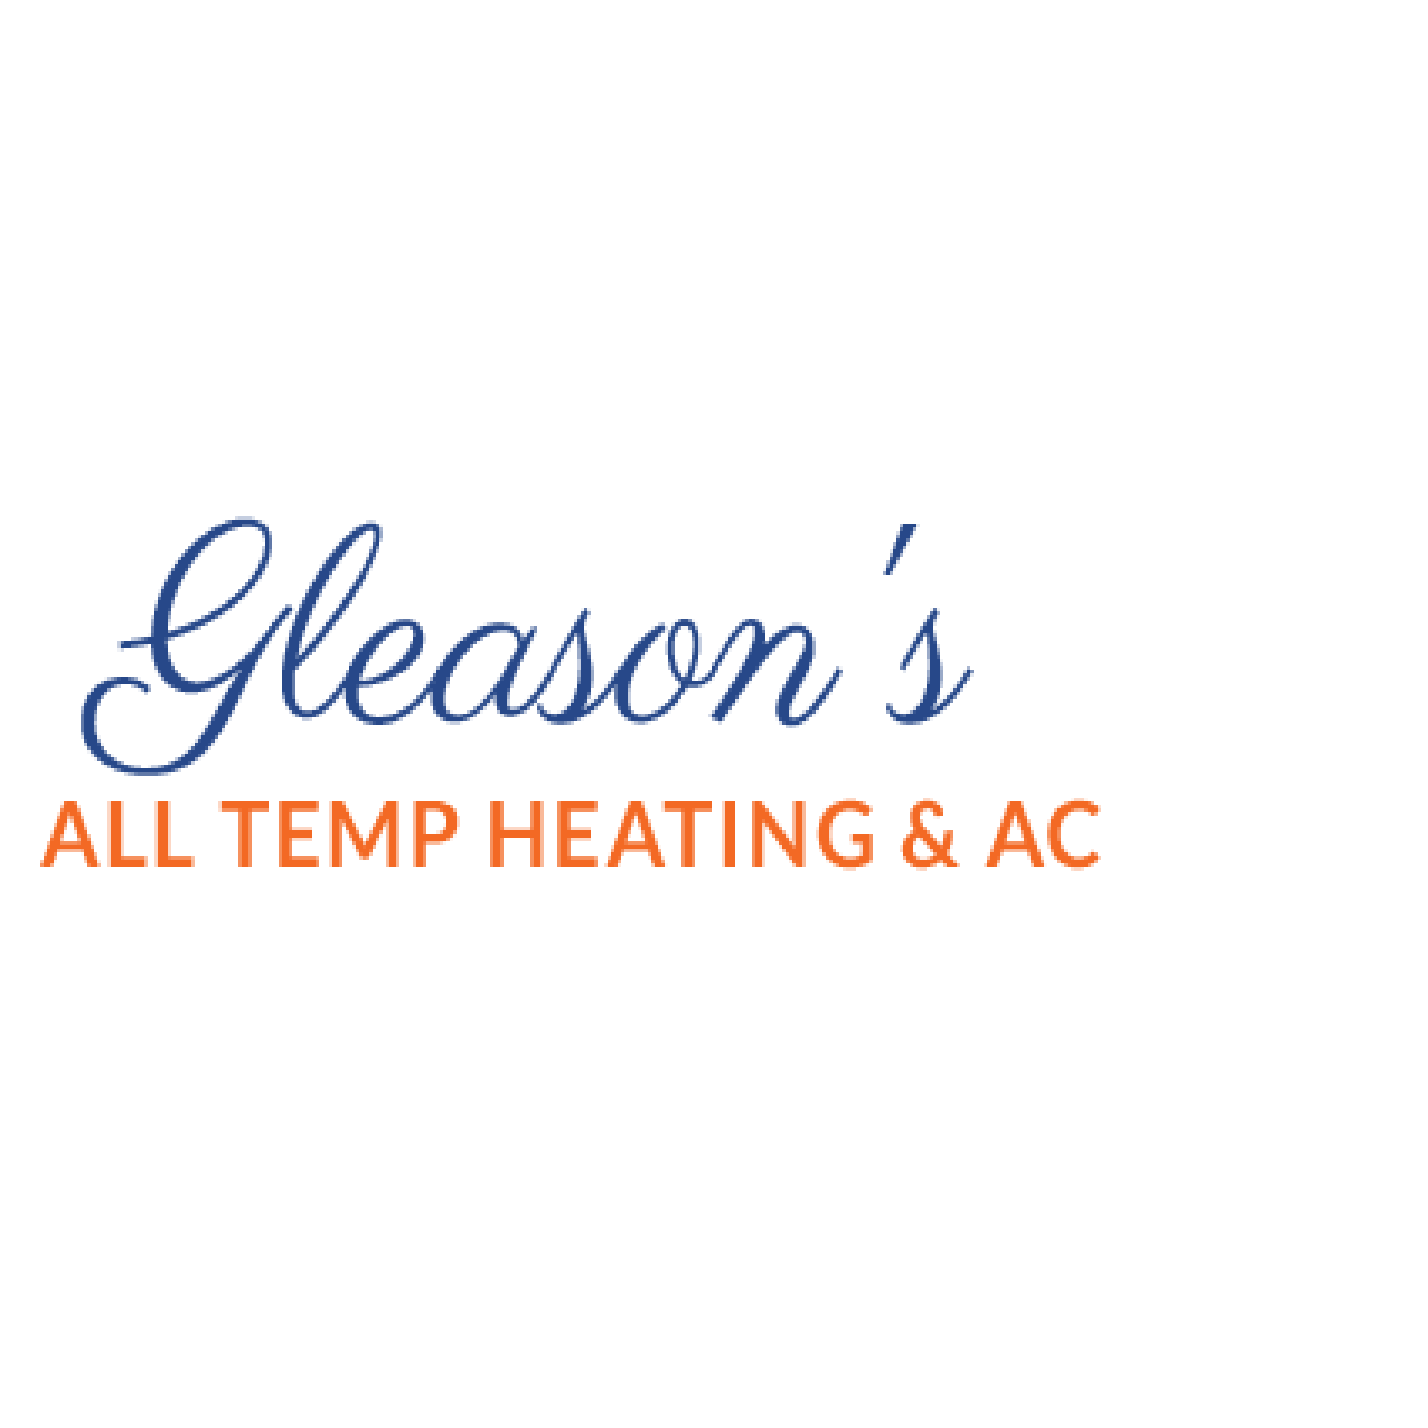 Gleasons All Temp Heating & AC